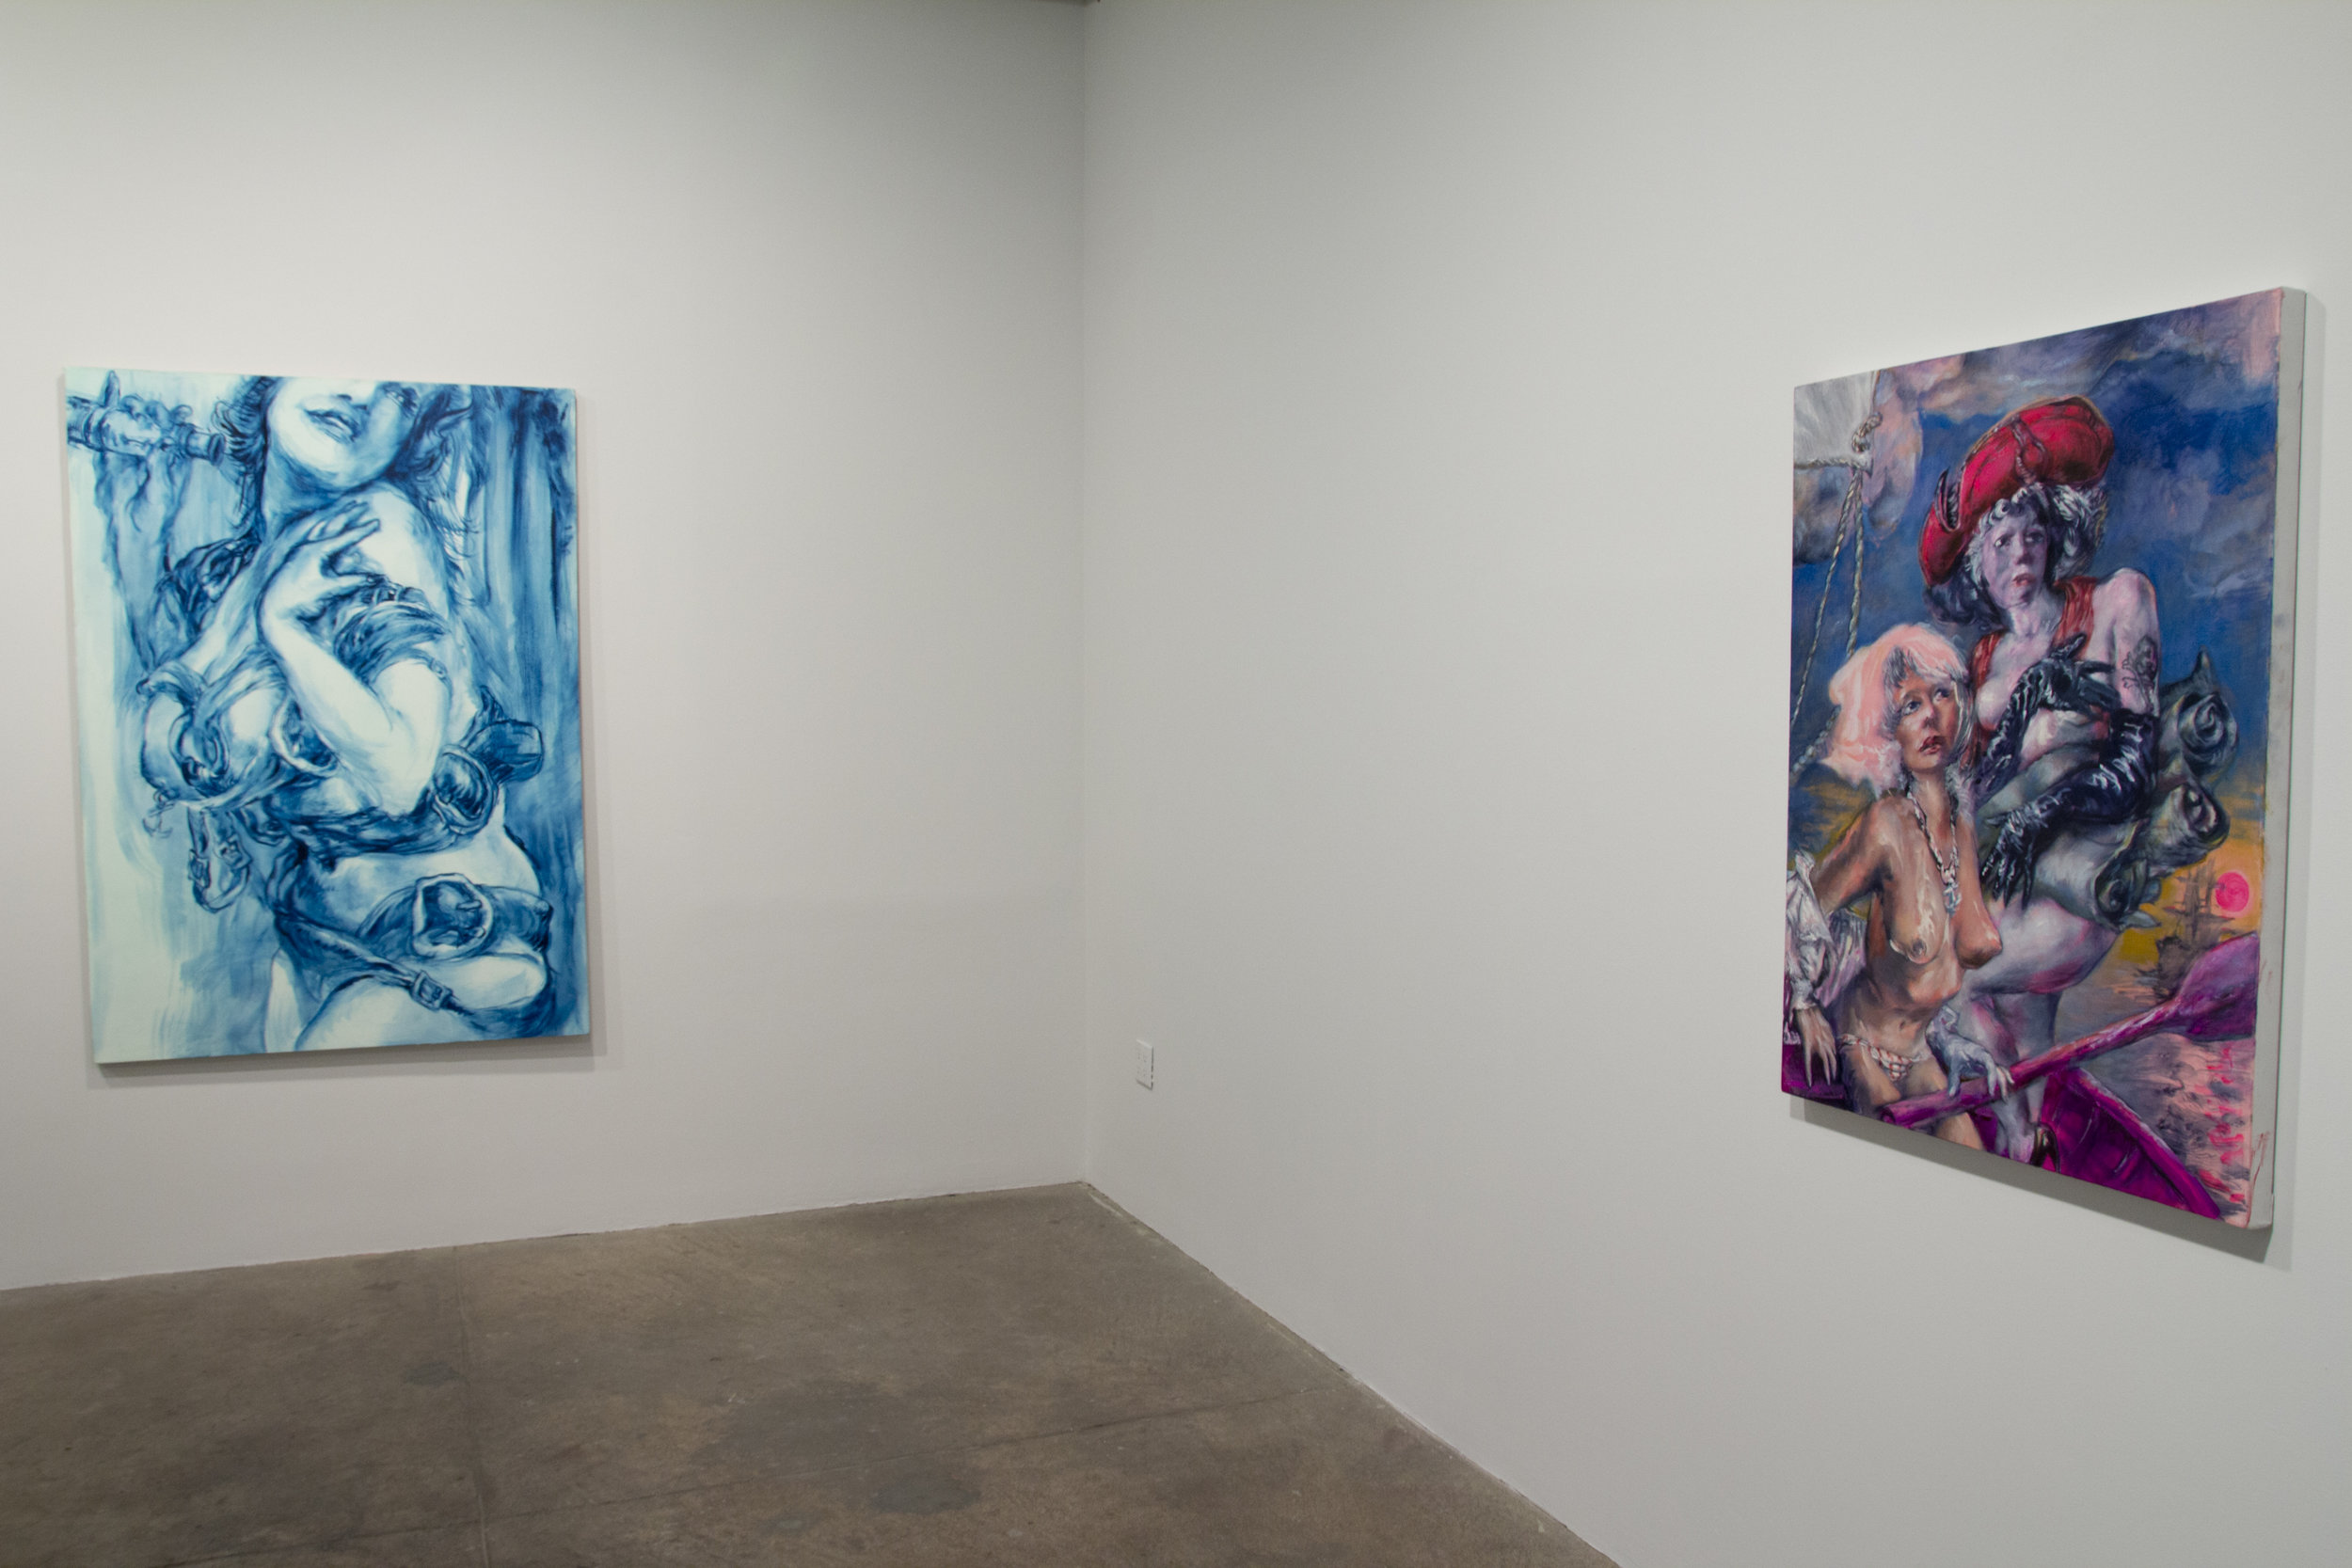 left: Blind Eye (2012) Oil On Linen 68h x 48w in (172.72h x 121.92w cm)